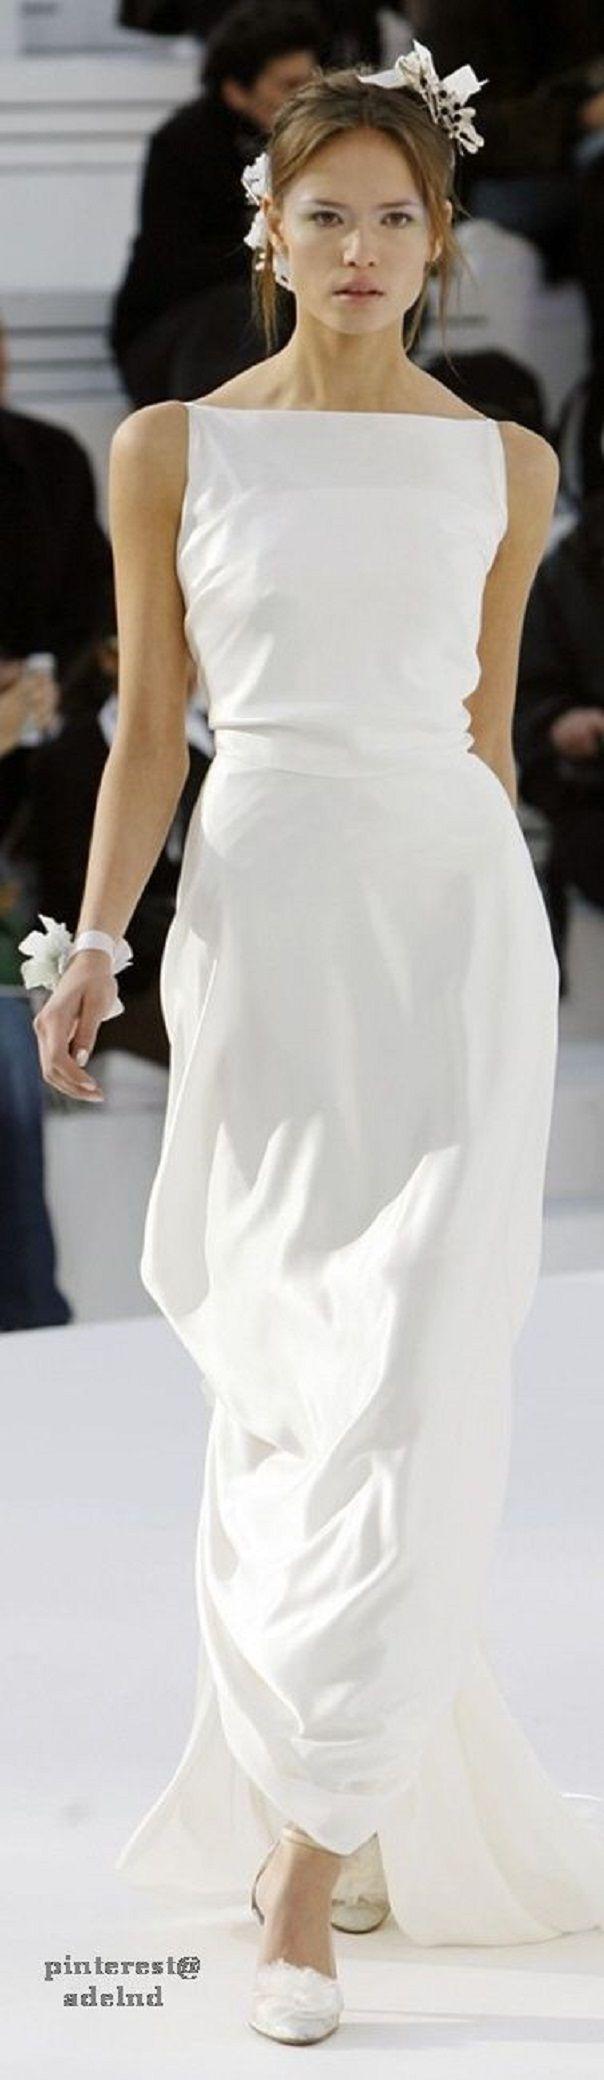 chanel wedding dress on pinterest chanel dress ian stuart wedding